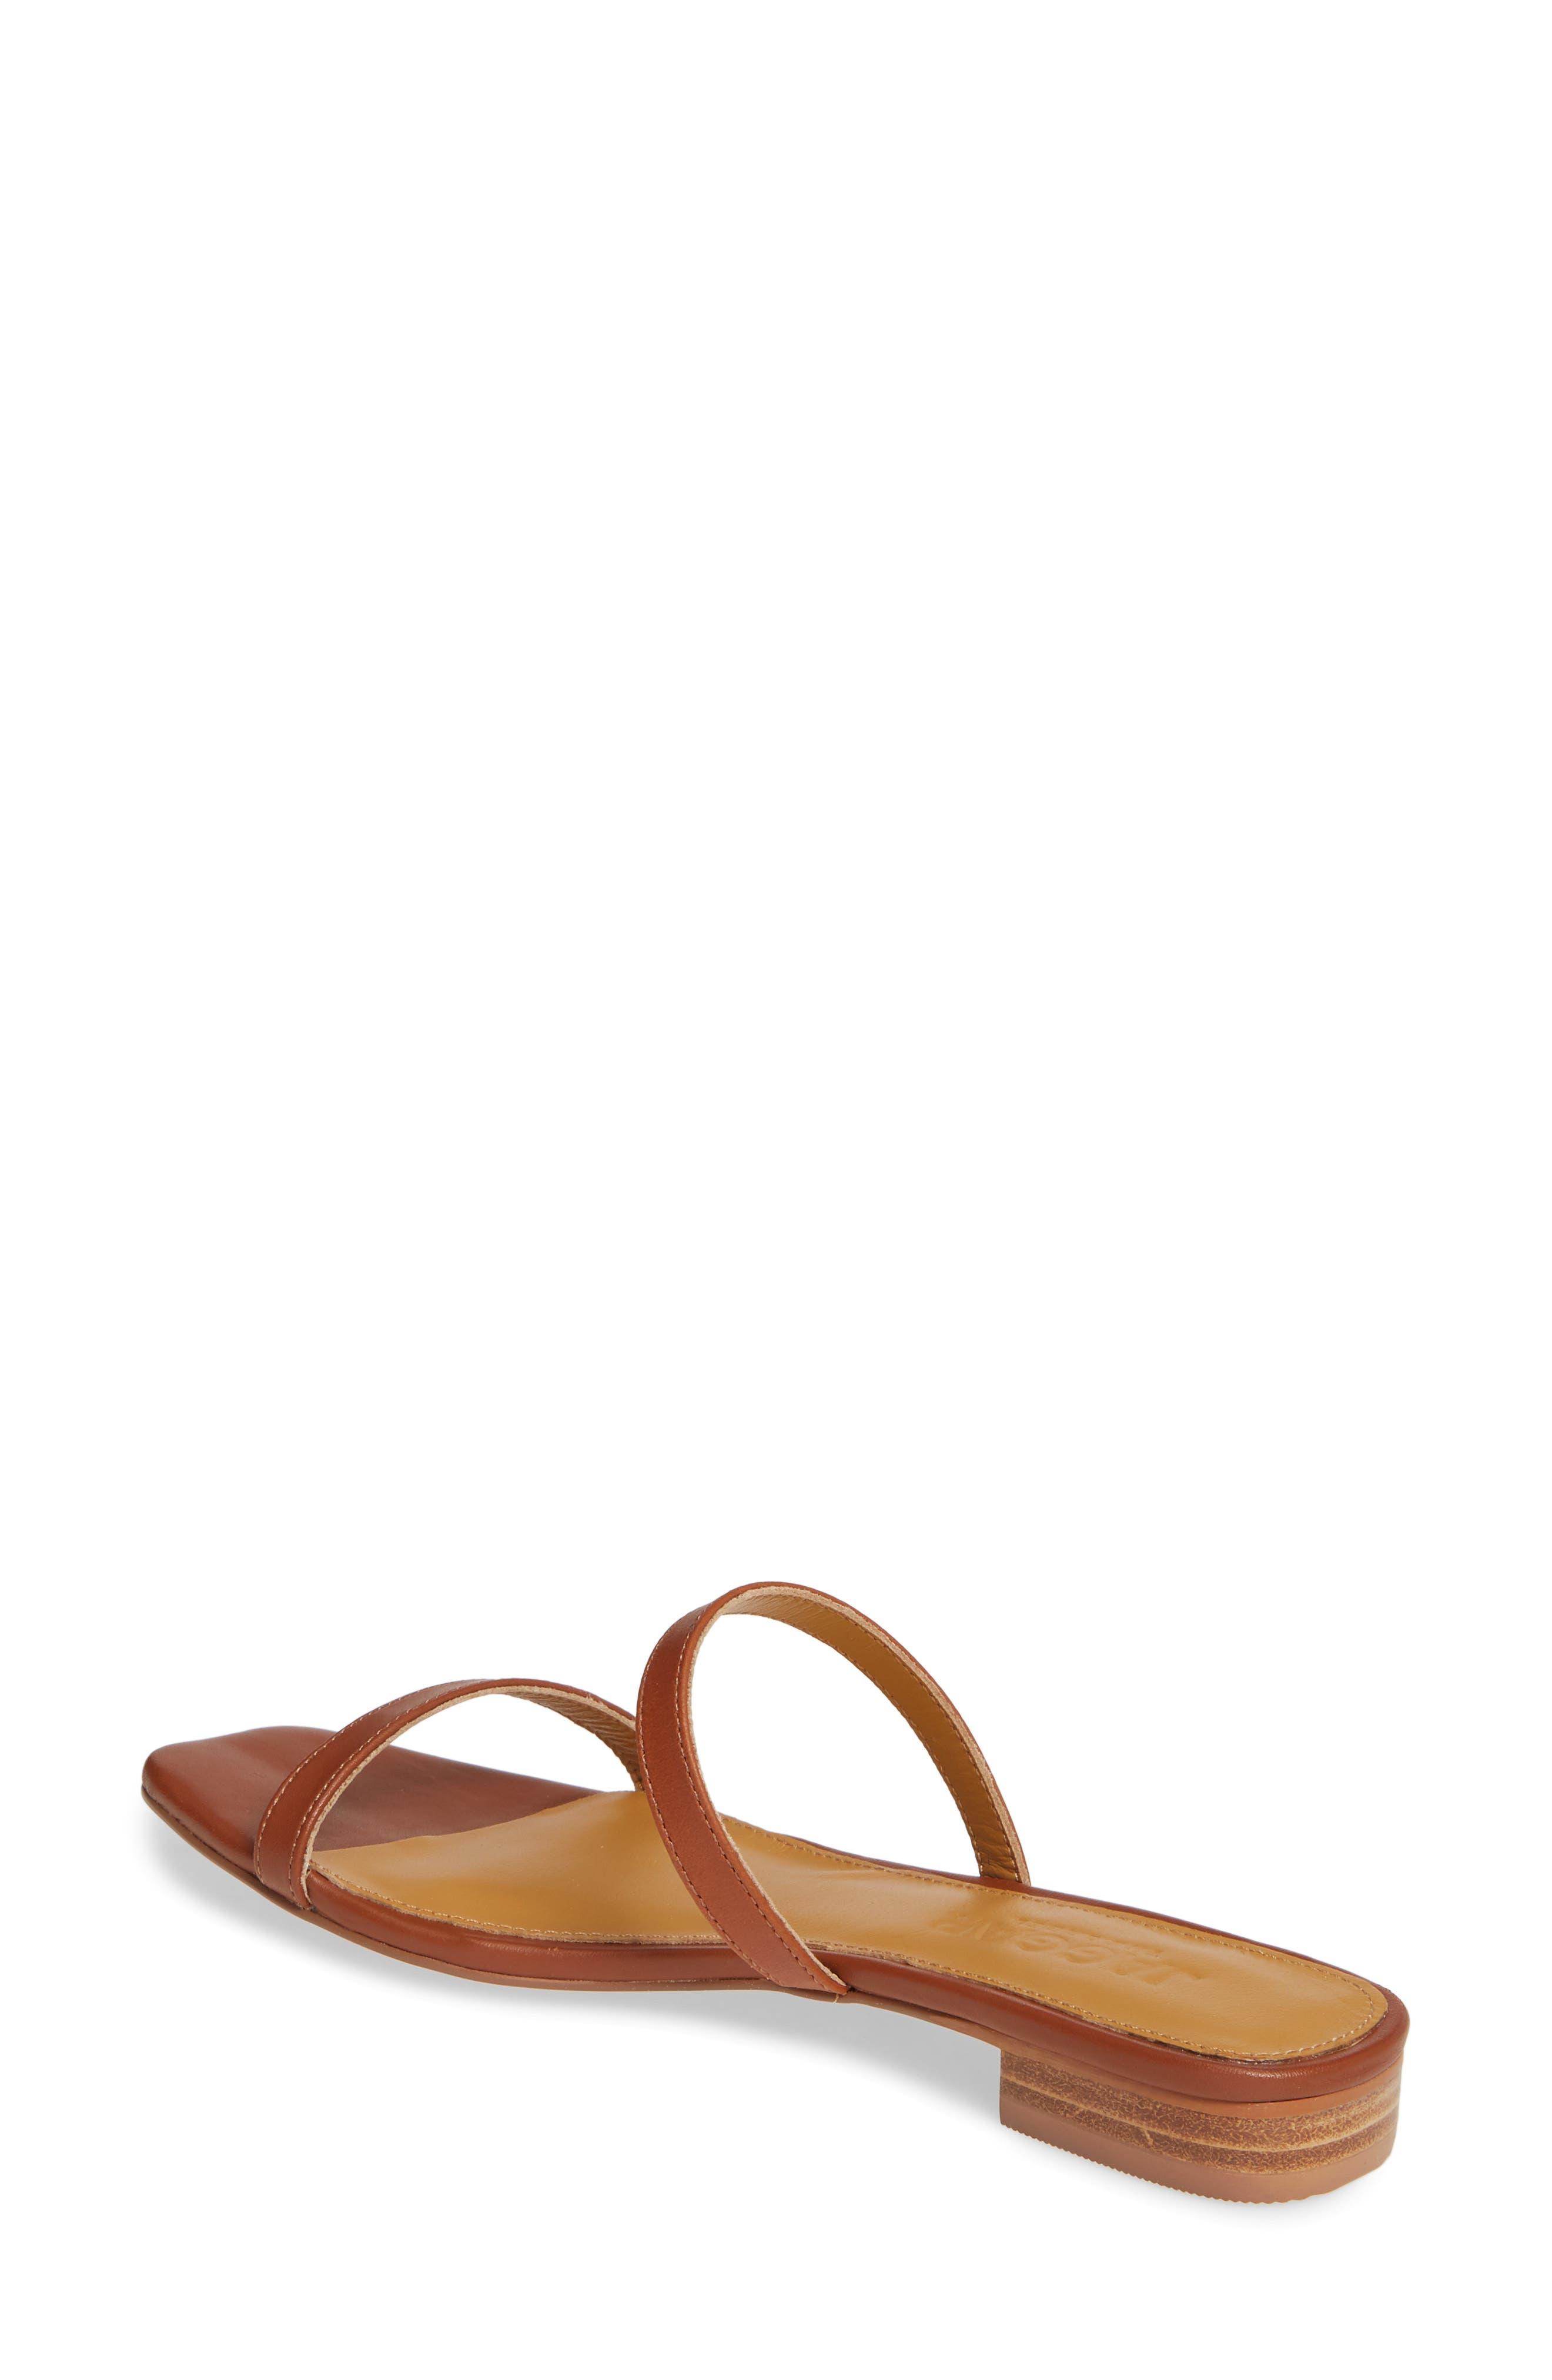 JAGGAR, Sprung Slide Sandal, Alternate thumbnail 2, color, RUST LEATHER